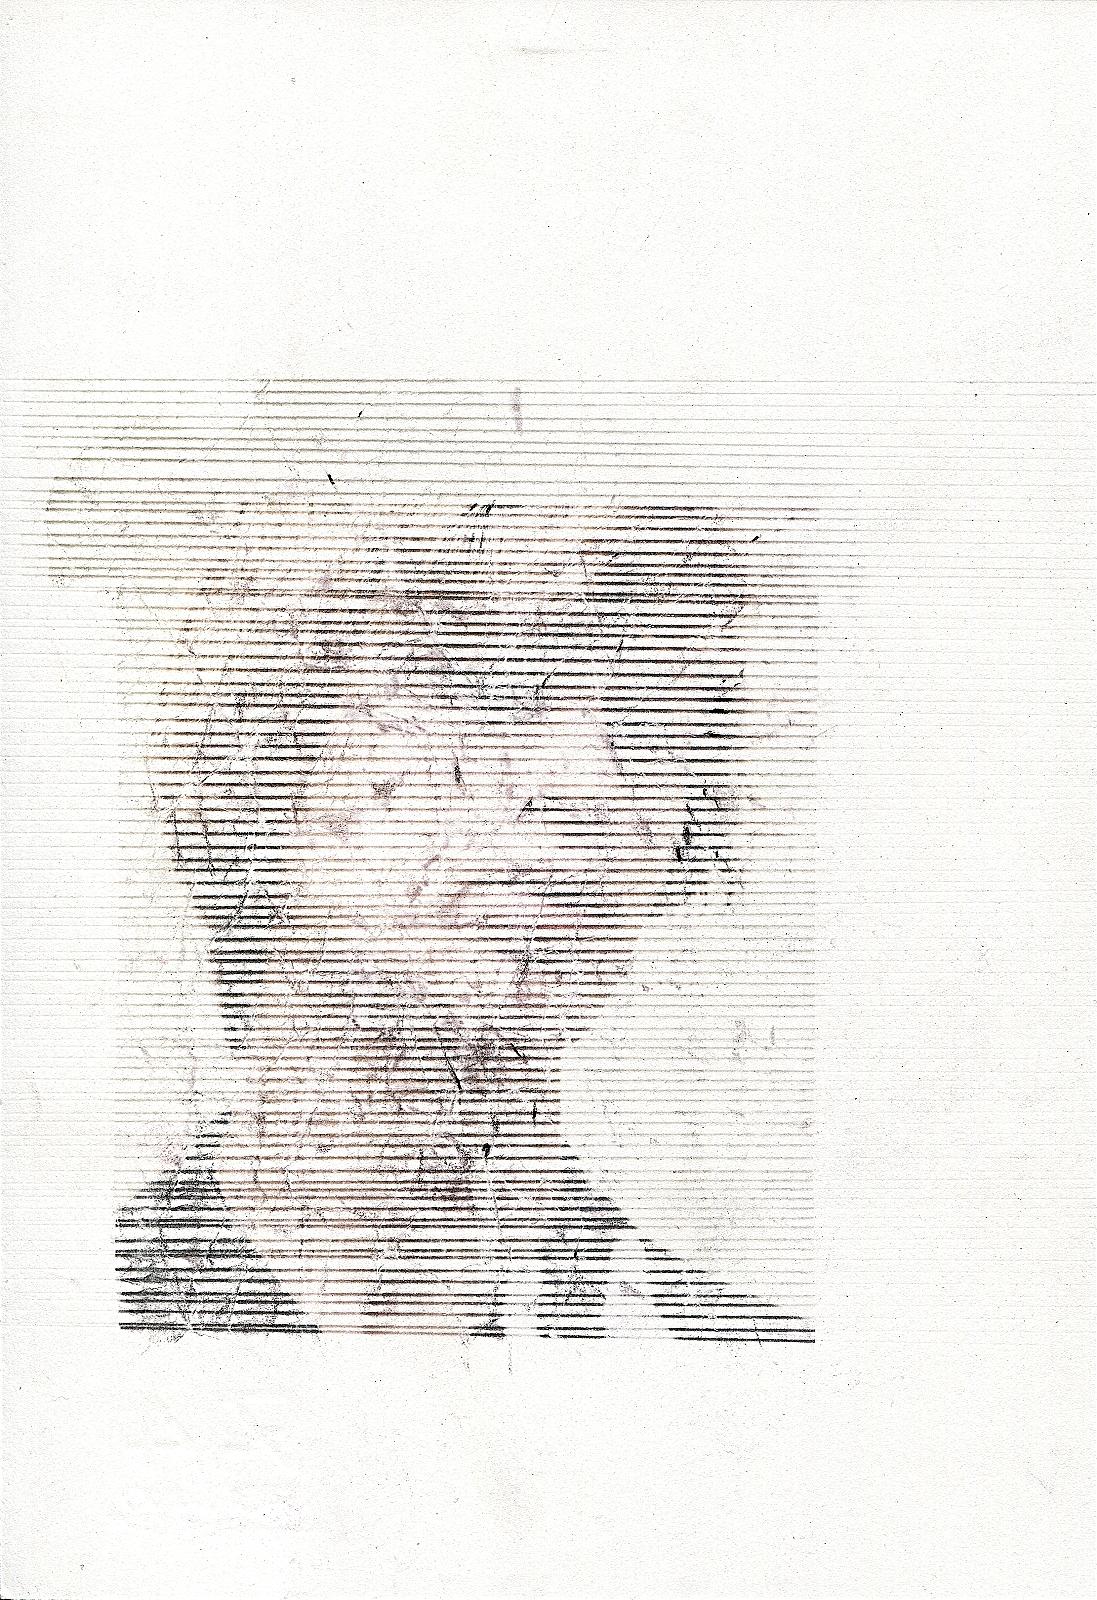 """Scratchhead"", 2017,  lavender-oil transferprint, pencil, 16.5 x 24.0 cm"